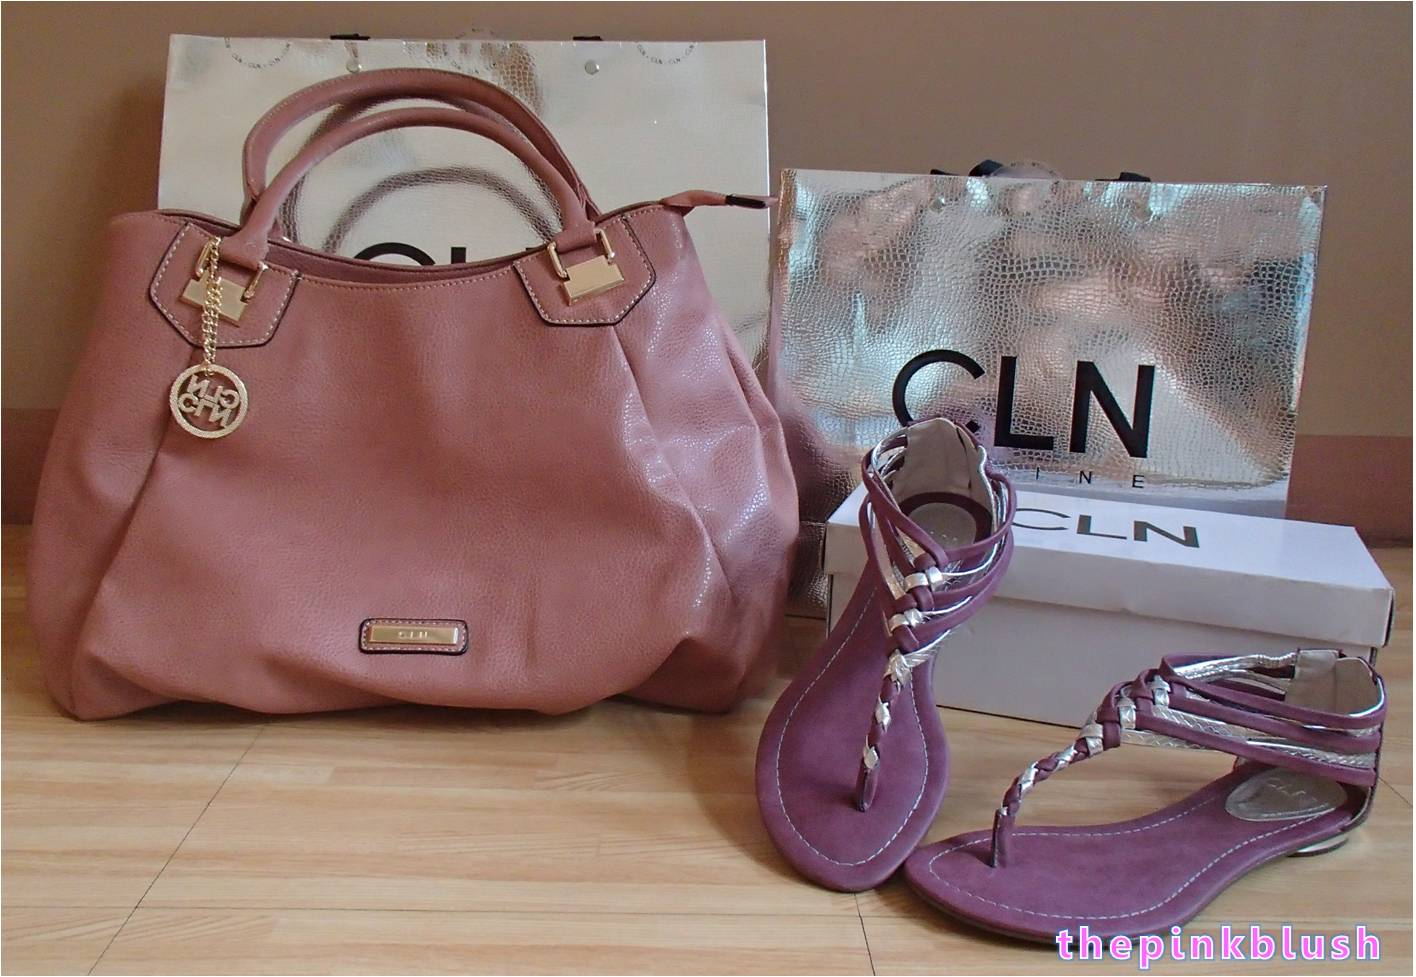 Cln bag and sandals2